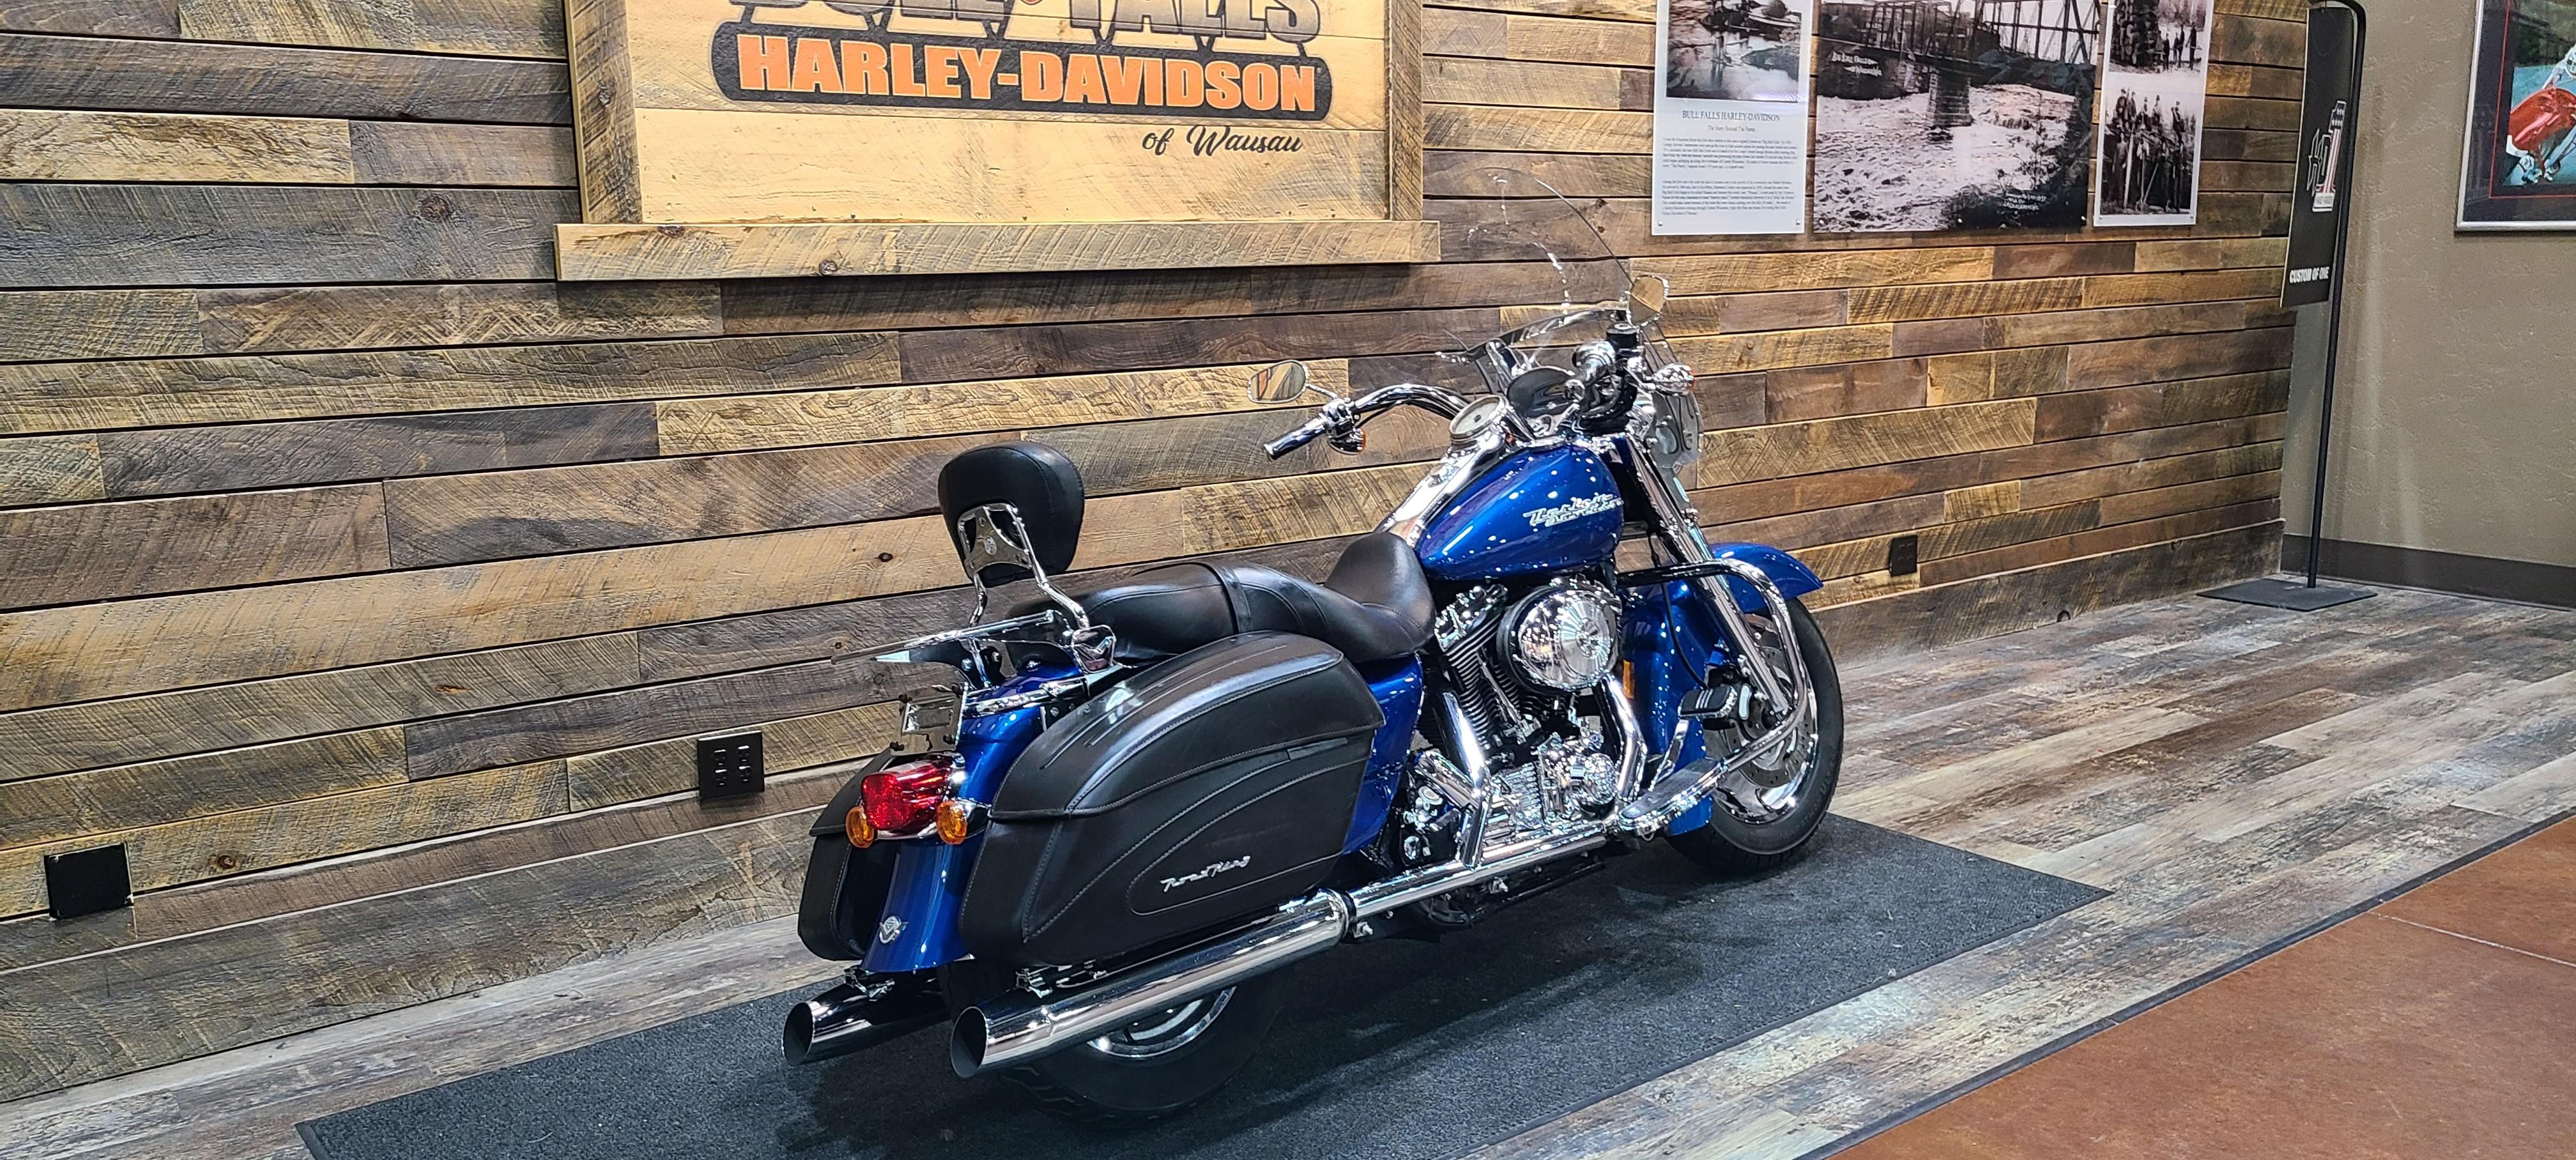 2005 Harley-Davidson Road King Custom at Bull Falls Harley-Davidson